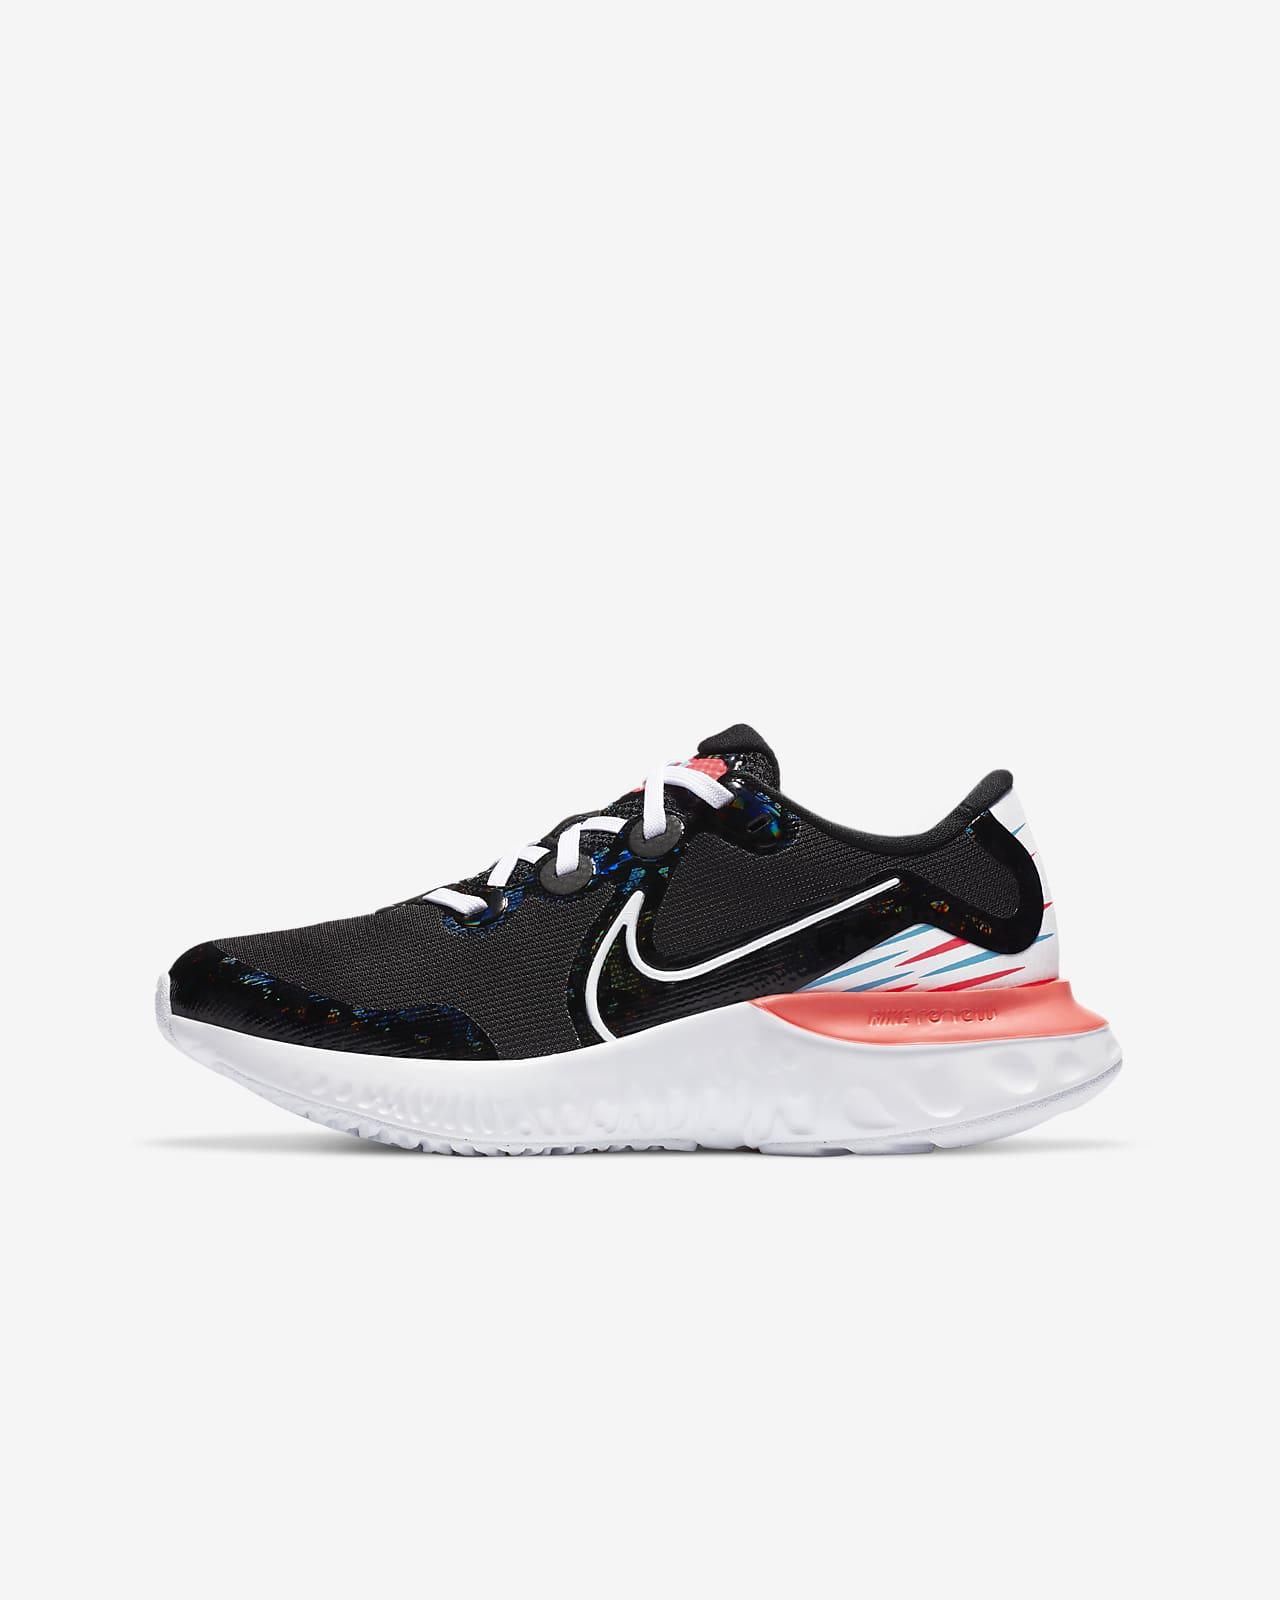 Nike Renew Run Light Big Kids' Running Shoe